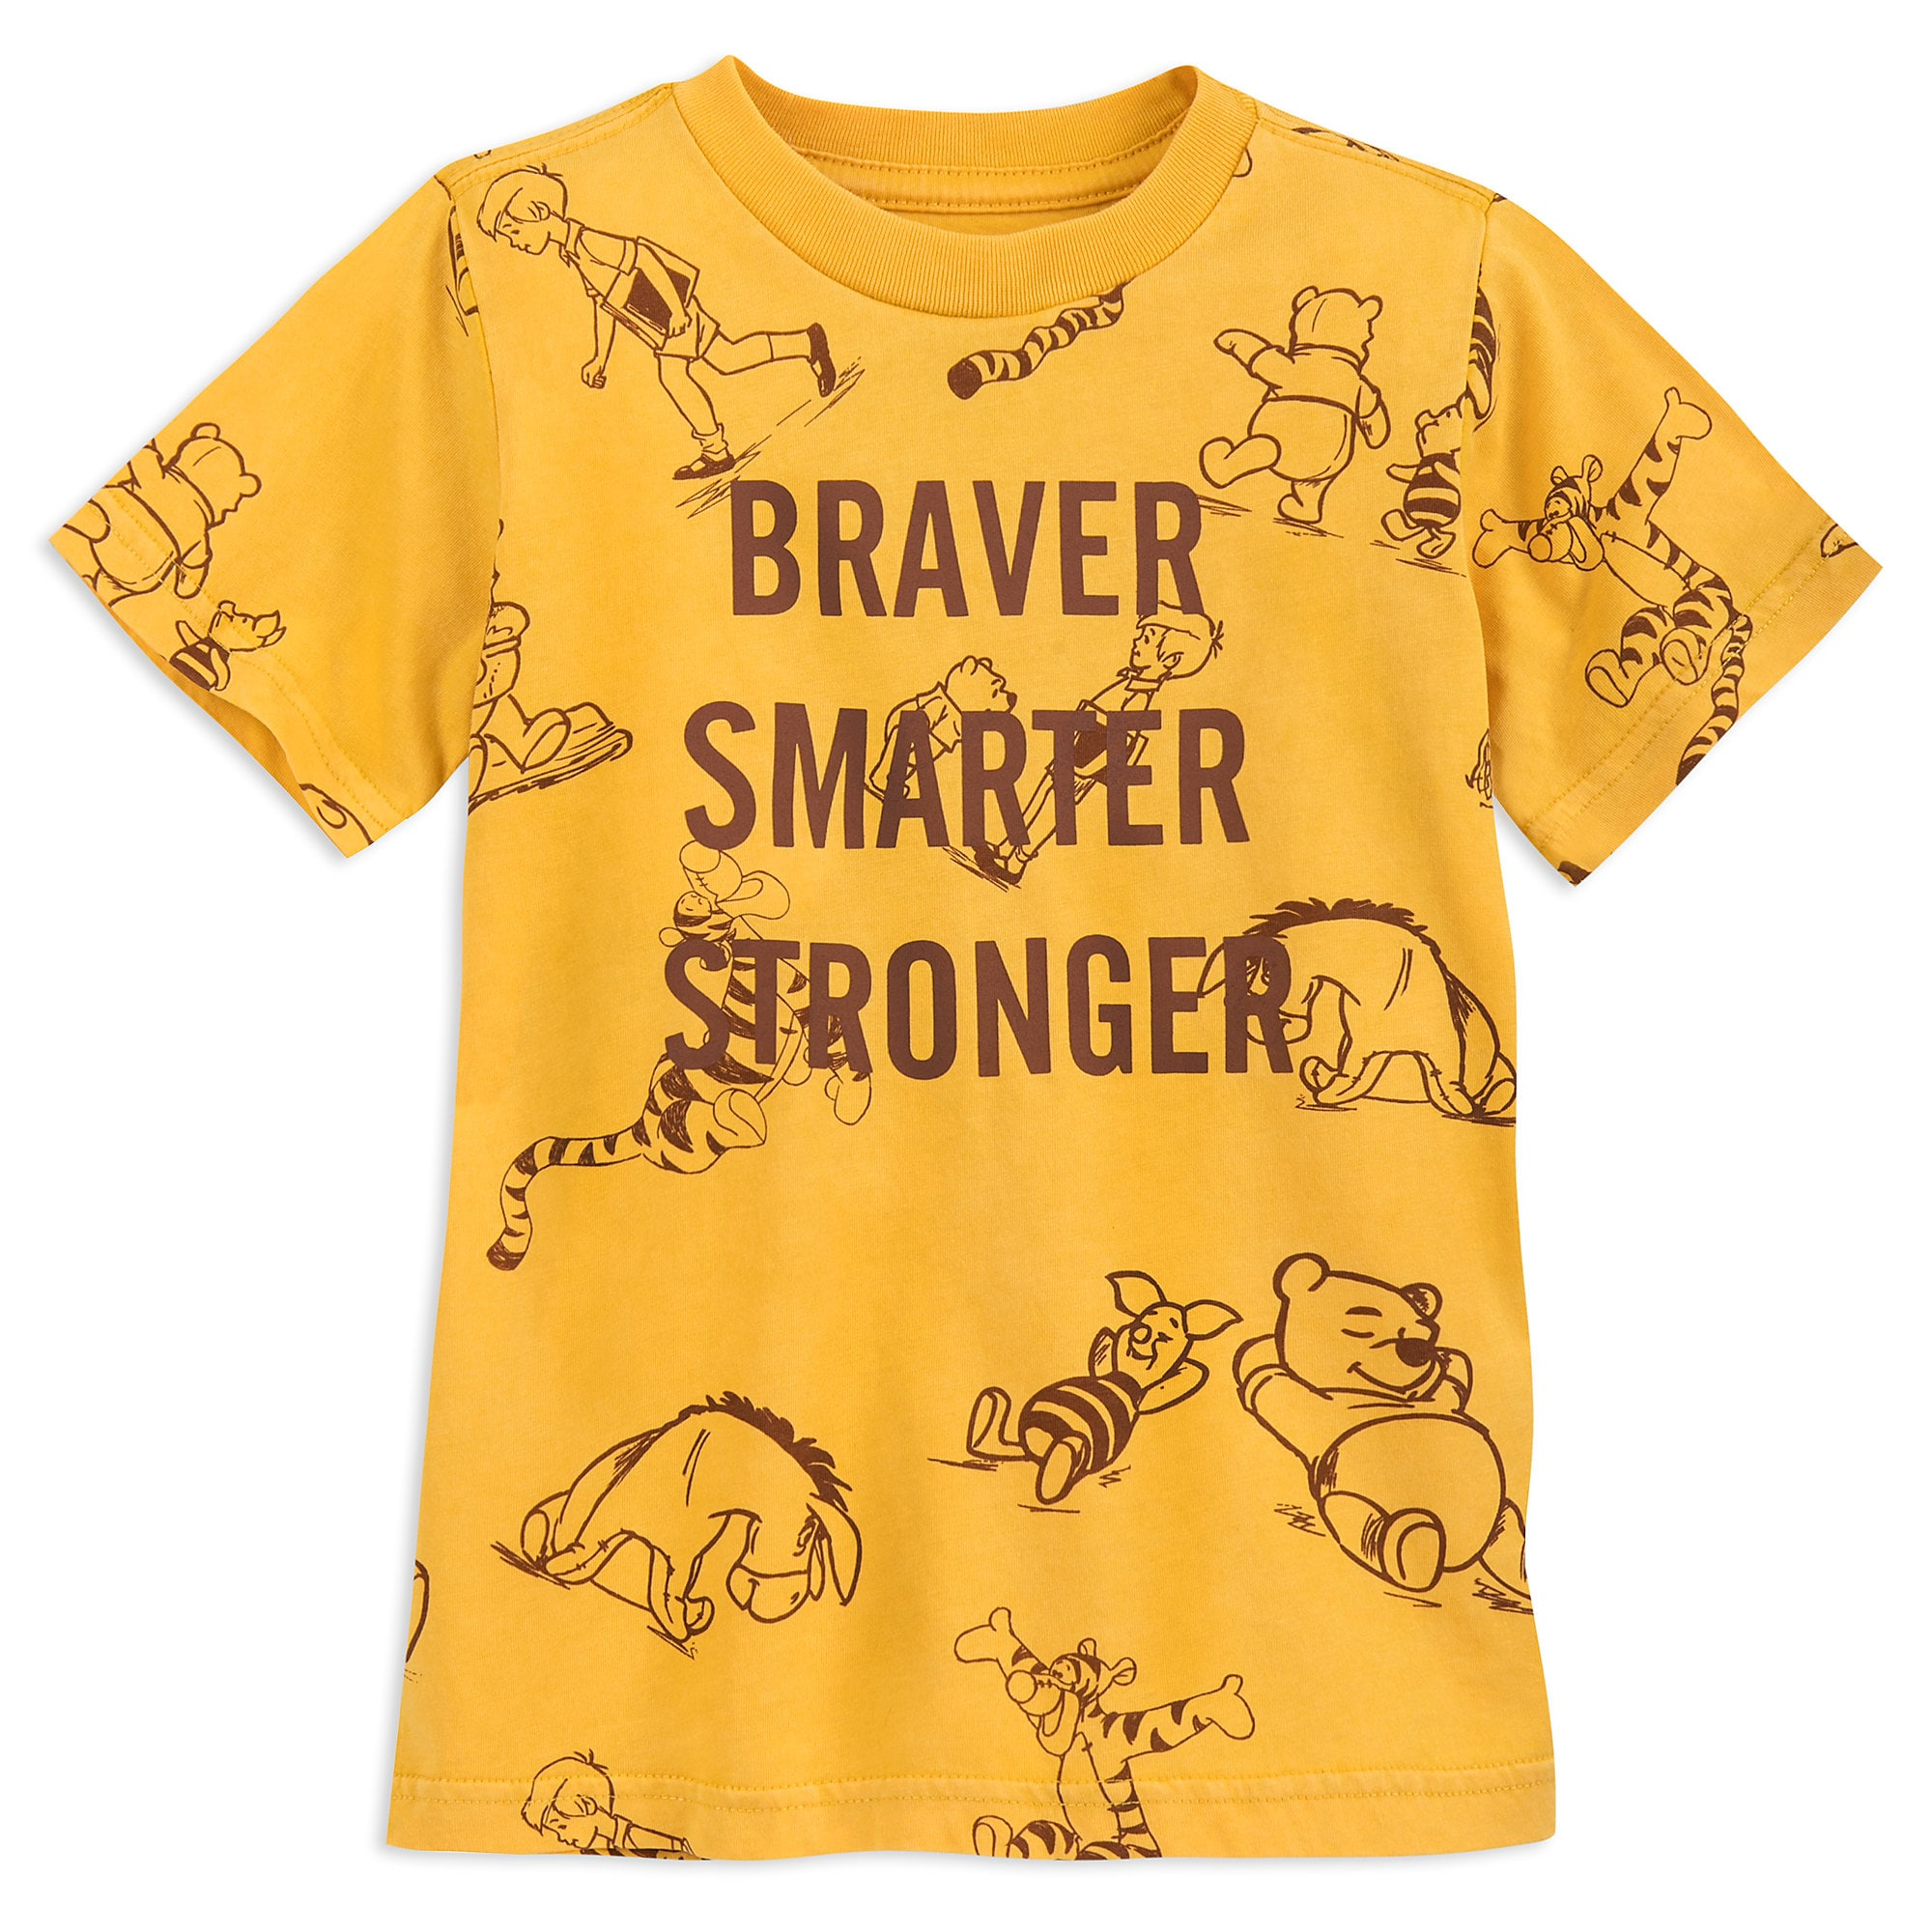 Winnie the Pooh T-Shirt for Boys